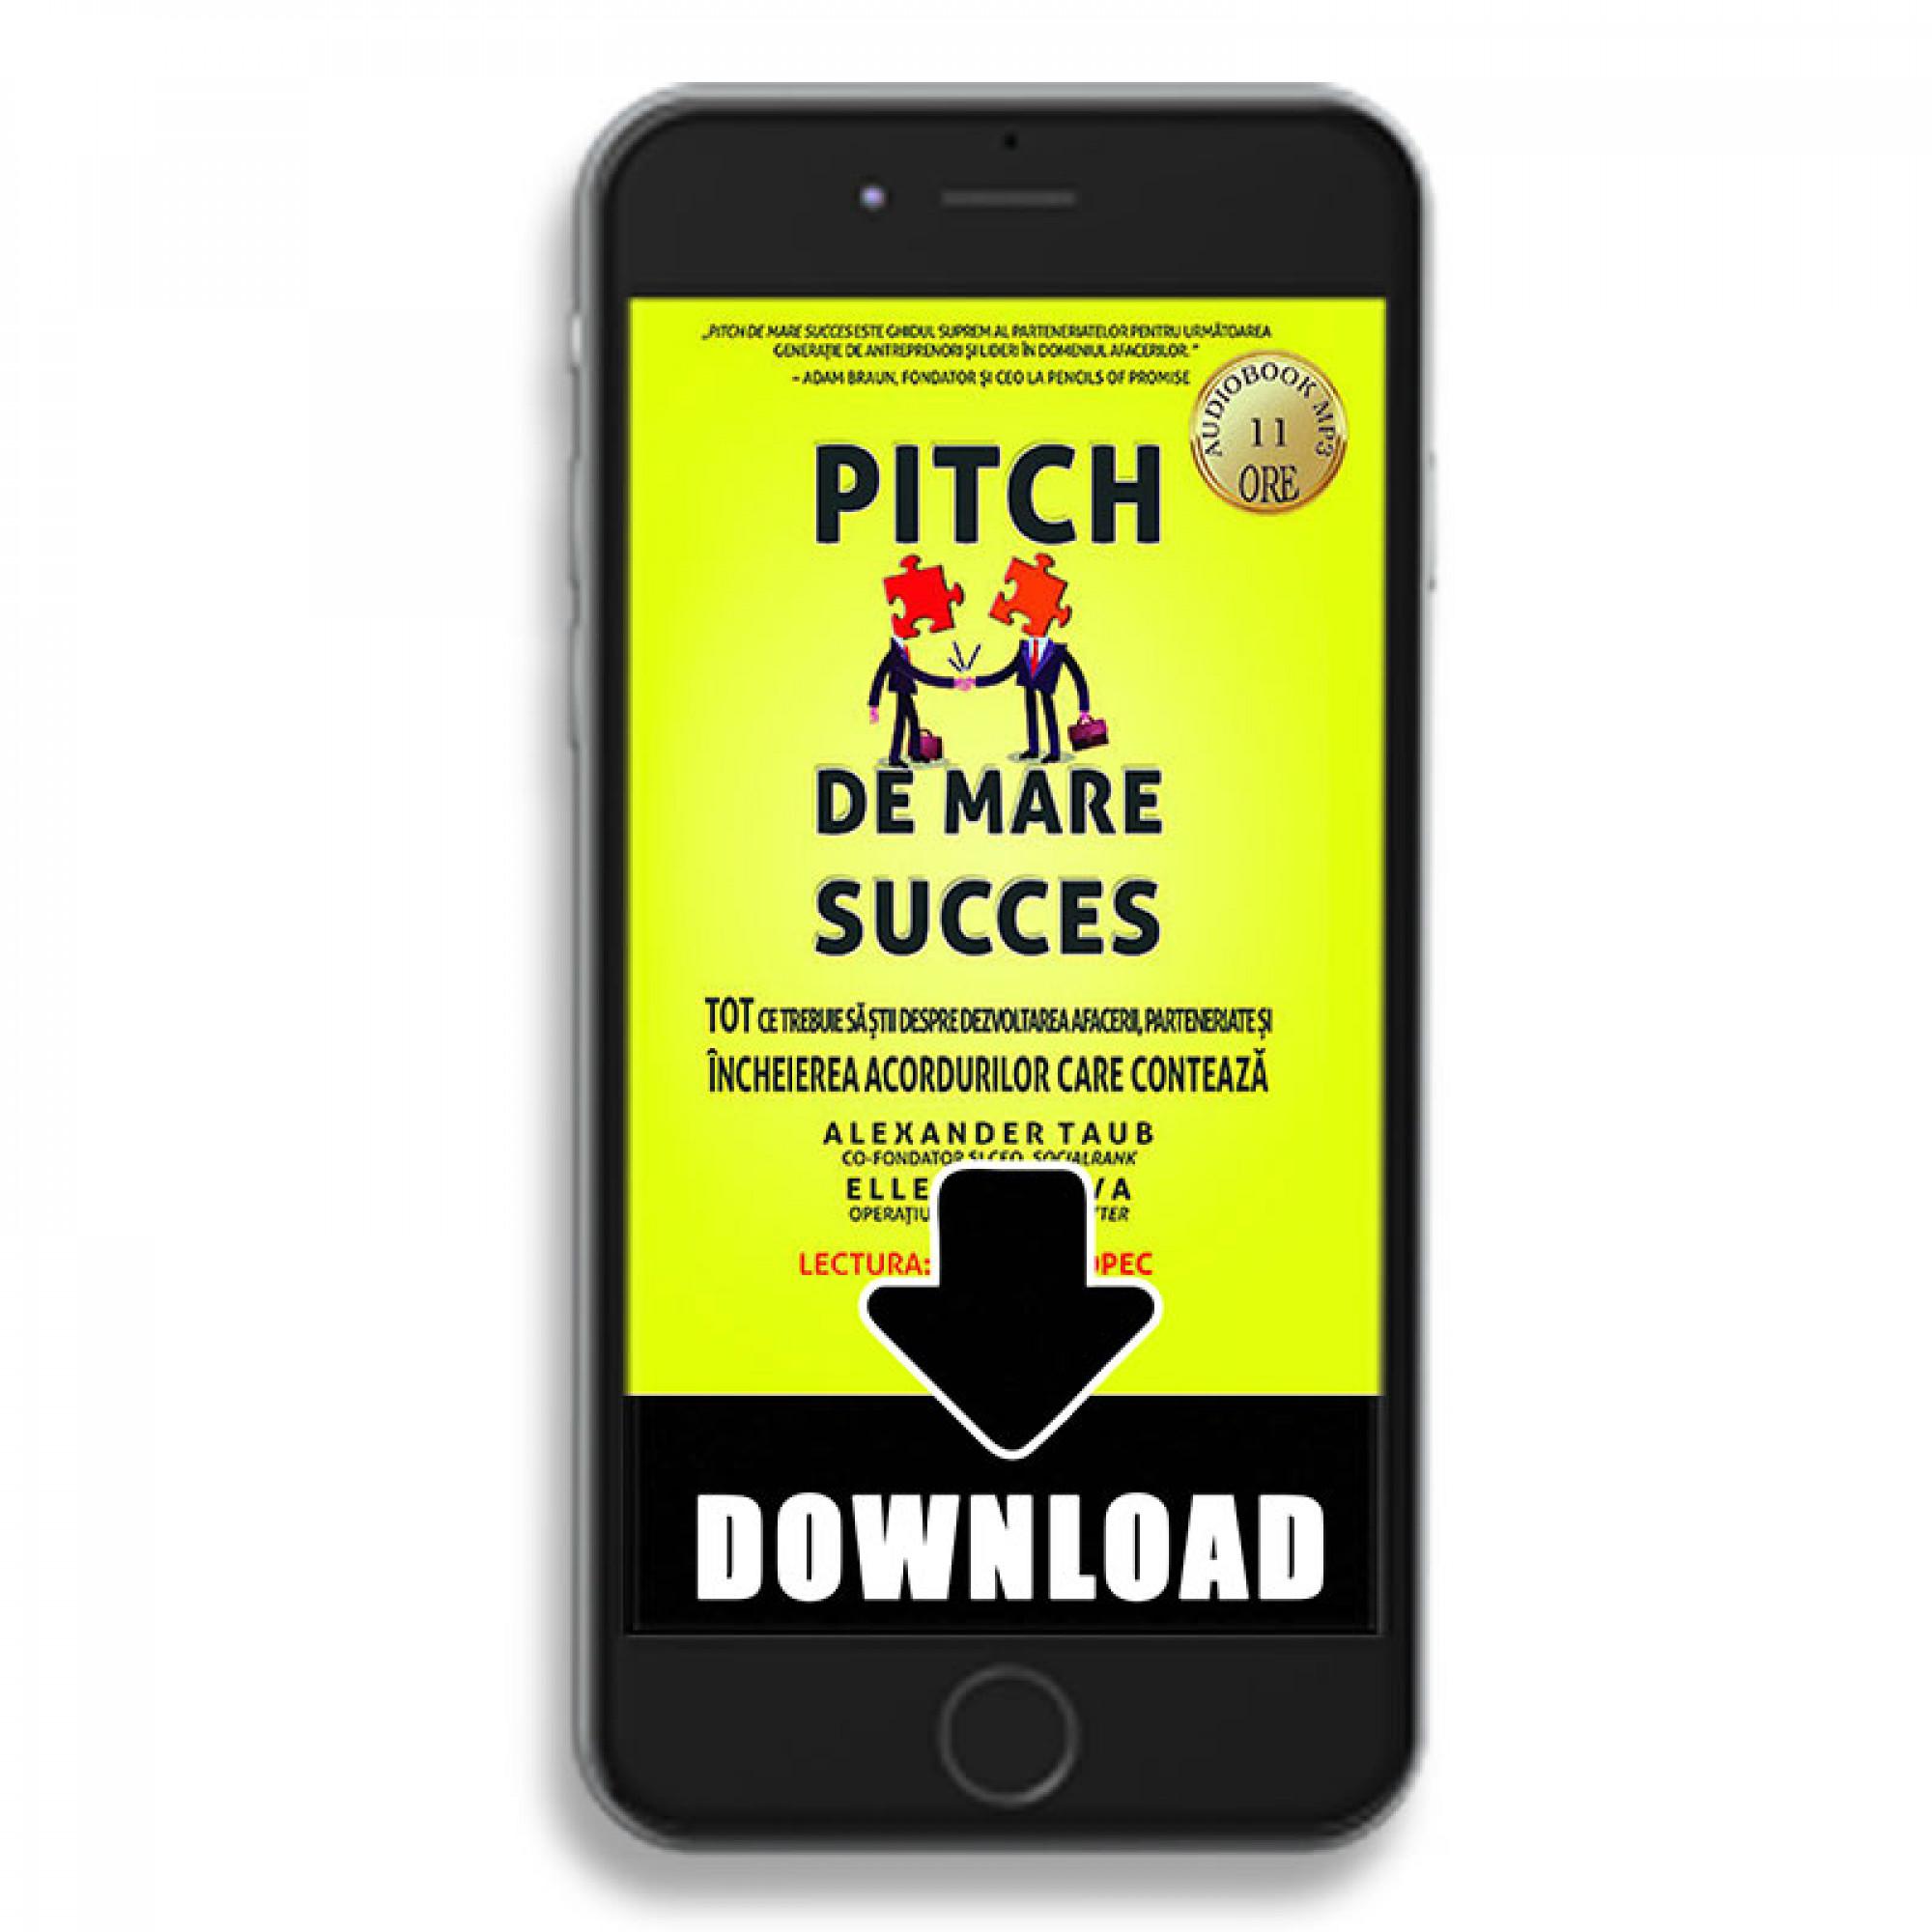 Pitch de mare succes